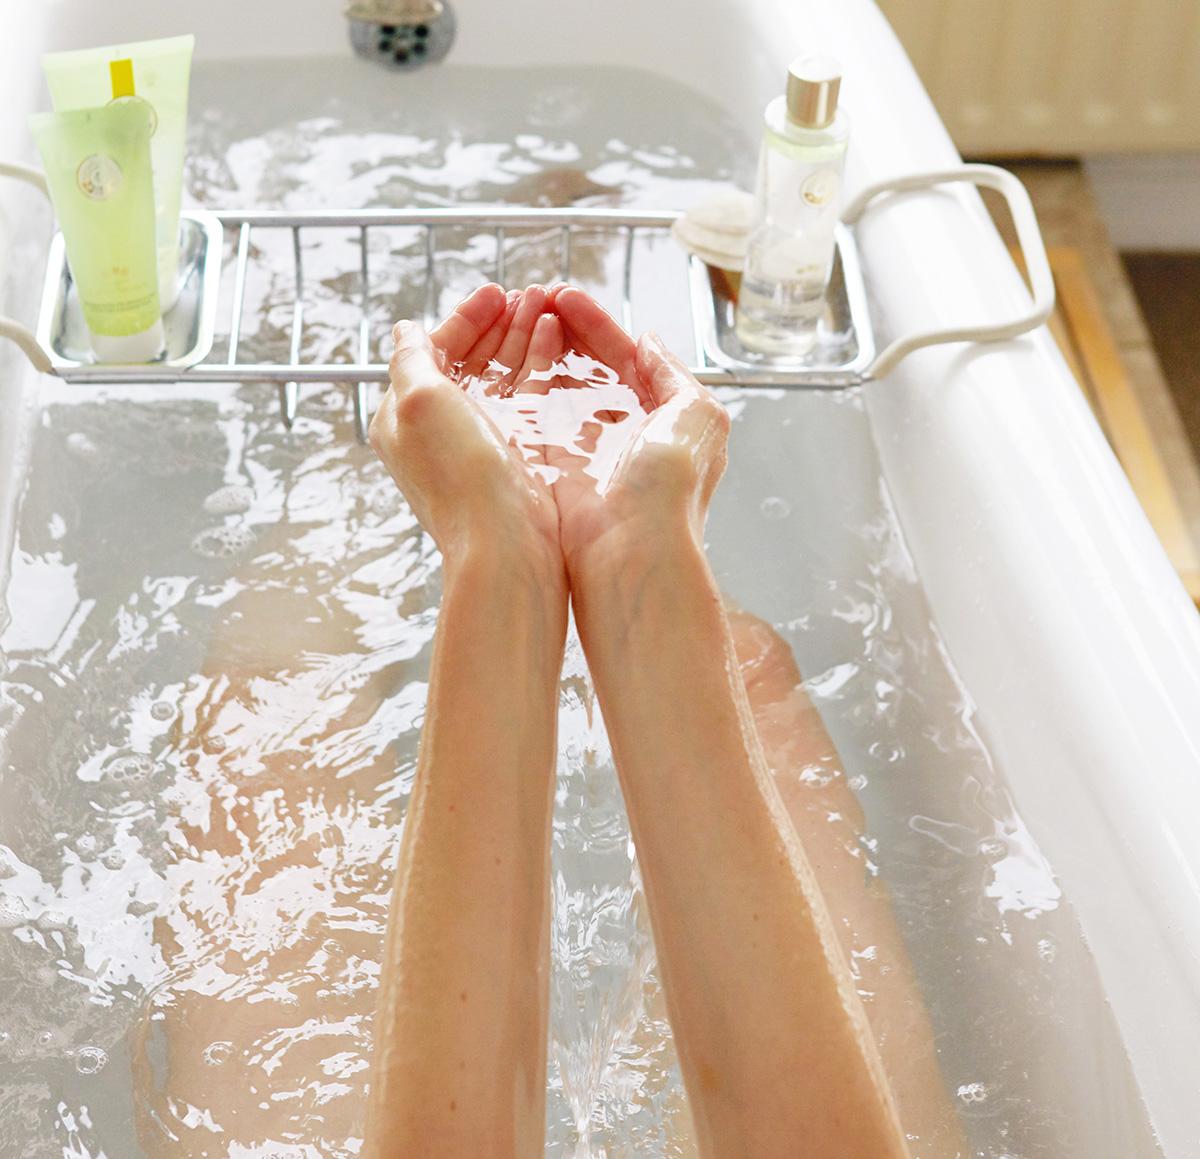 Luxe Digital luxury marketing strategy beauty industry skin care organic